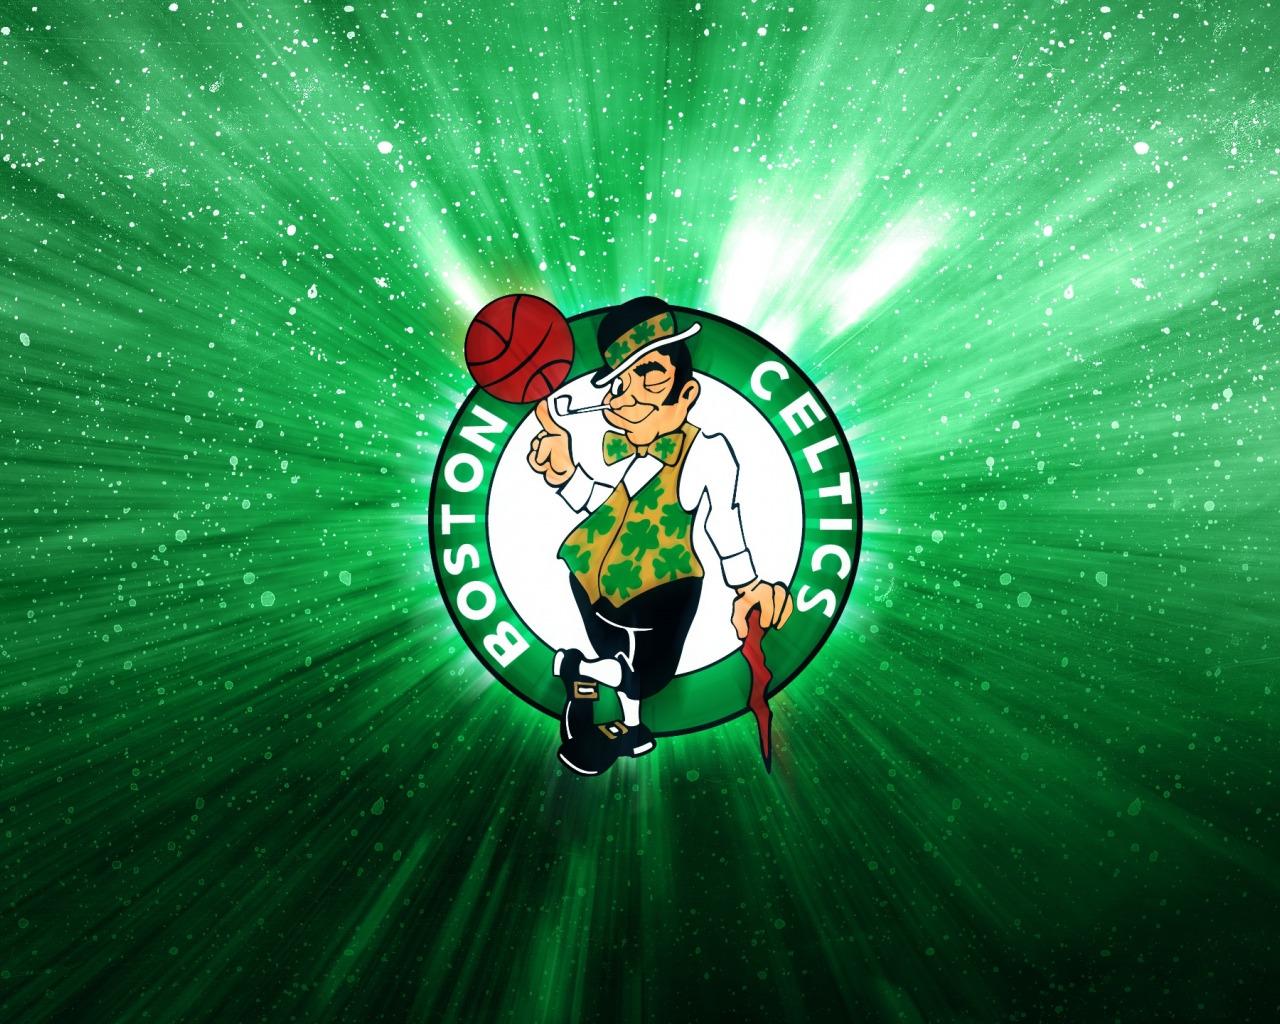 Boston celtics logo photos